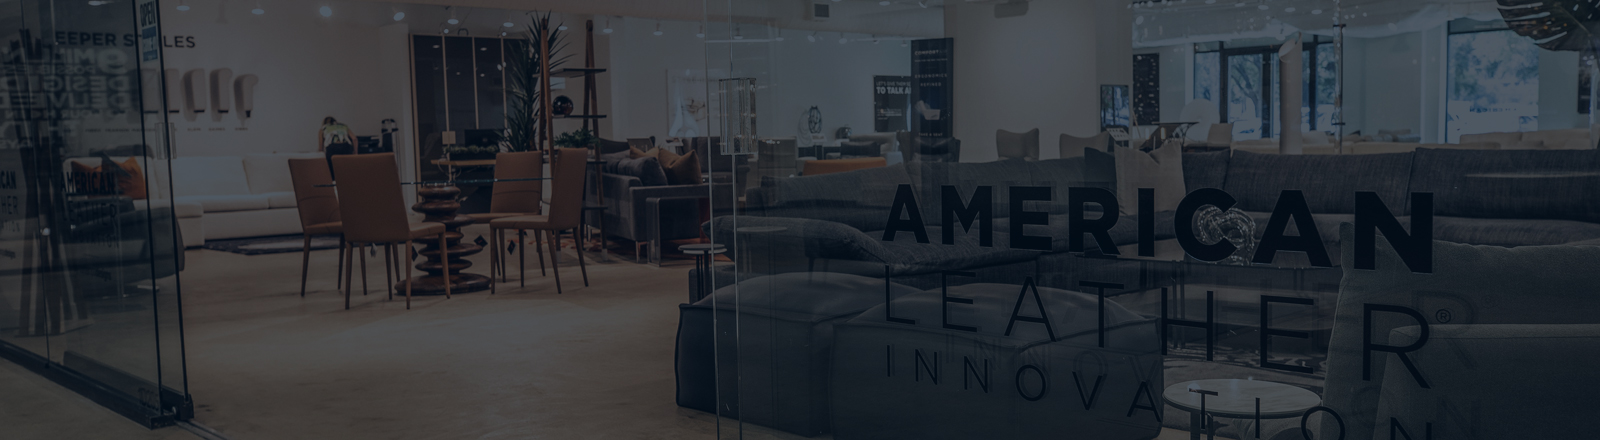 American Leather Innovation Dallas Texas